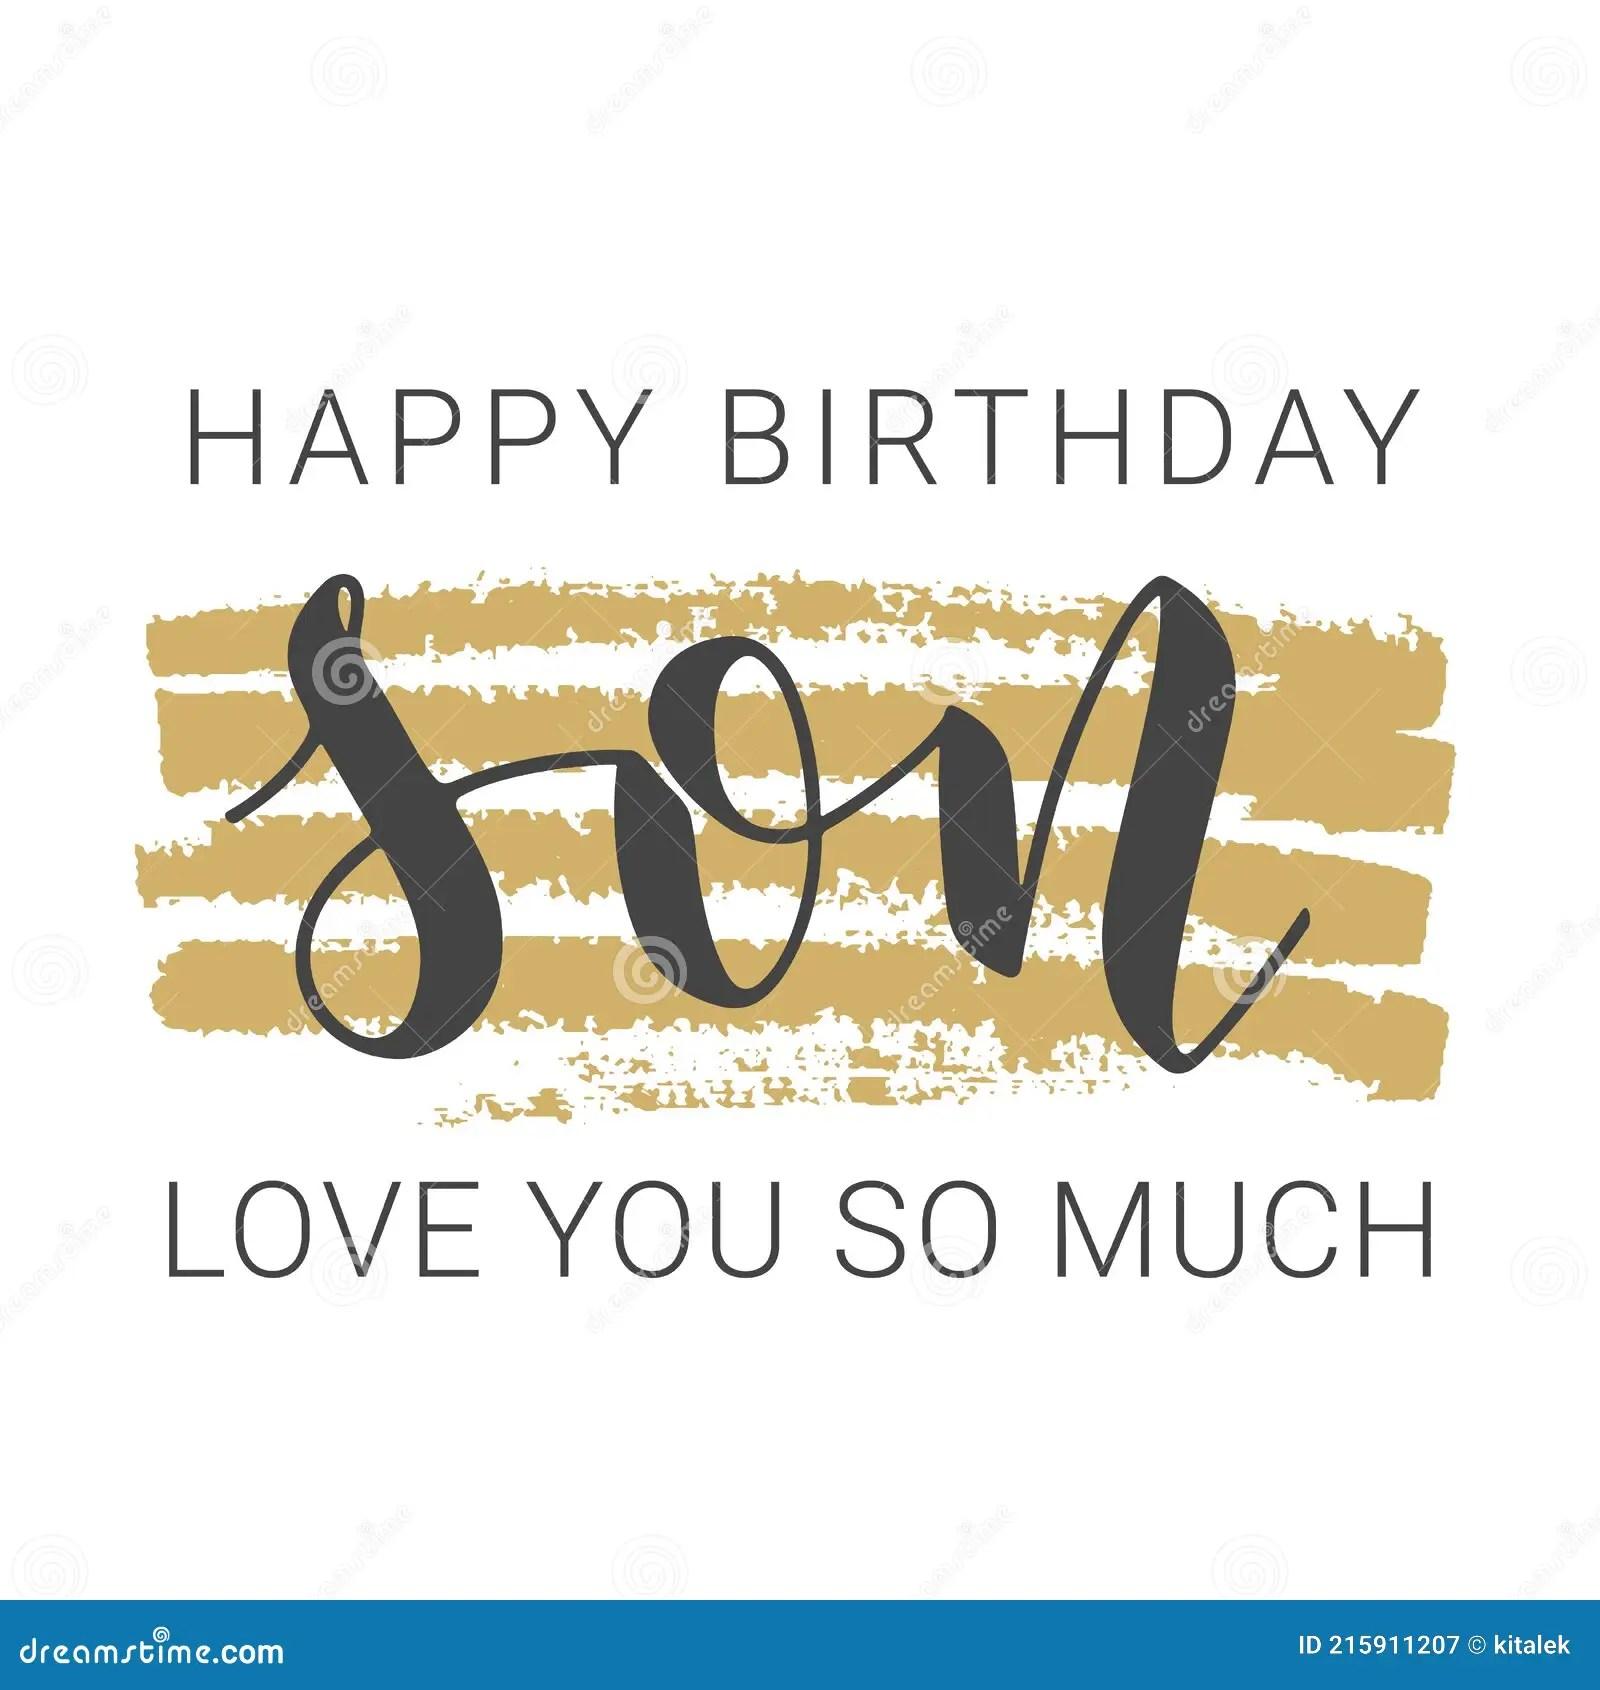 Happy Birthday Son Stock Illustrations 4 407 Happy Birthday Son Stock Illustrations Vectors Clipart Dreamstime